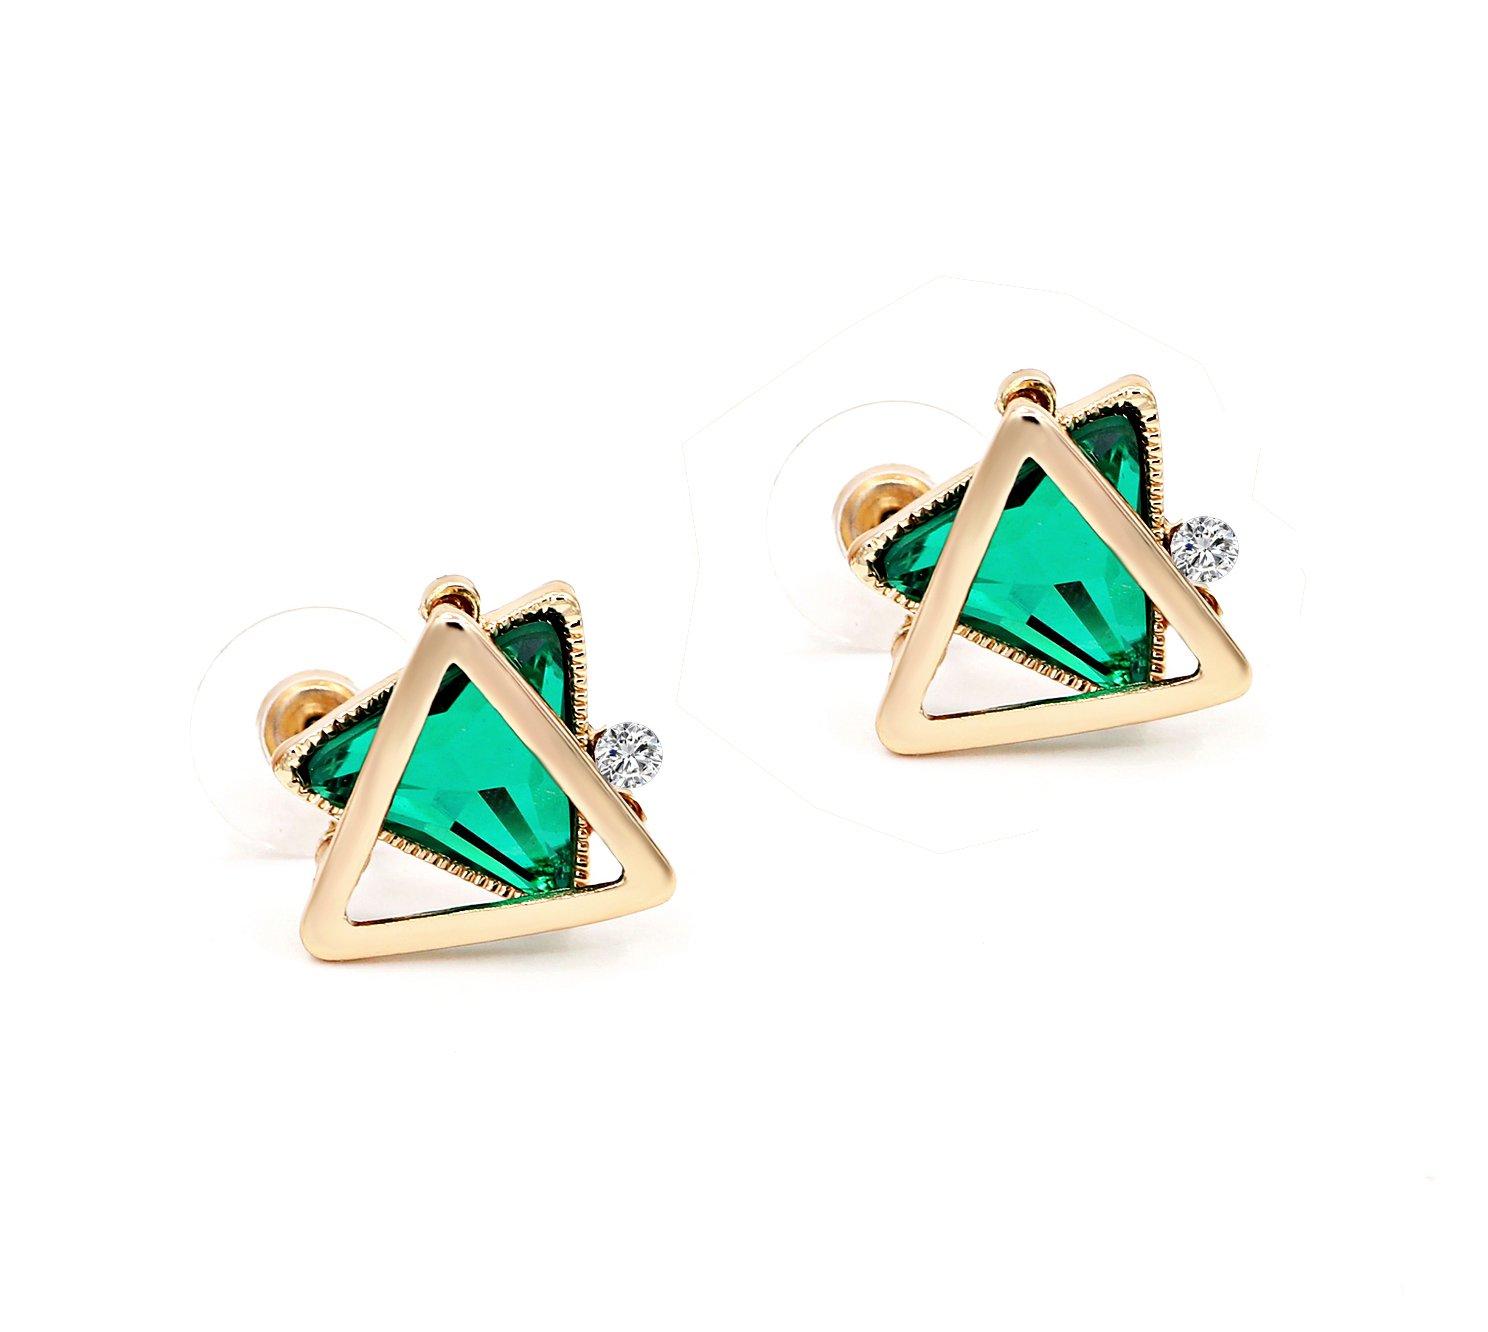 Zealmer Triangle Crystal Earrings Geometric Green Rhinestone Stud Earrings Gift for Women Valentine's Day